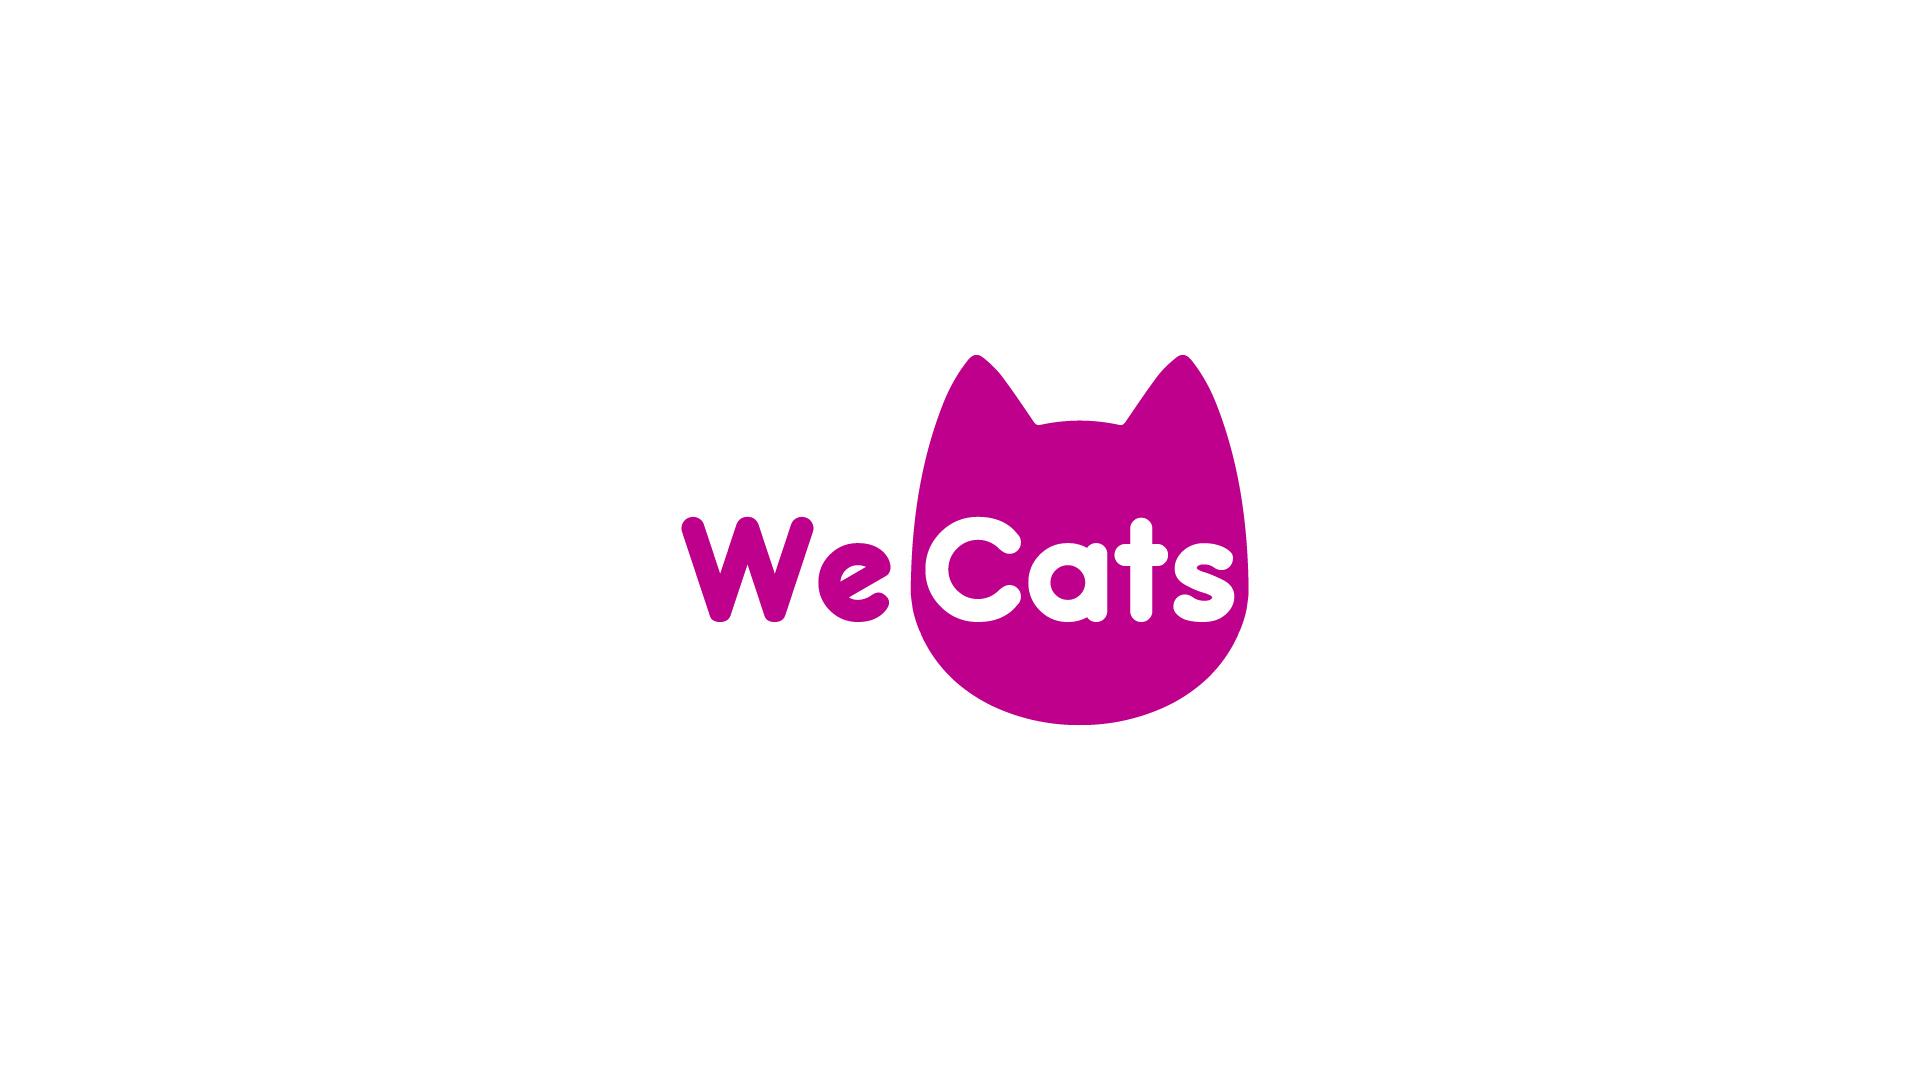 Создание логотипа WeCats фото f_0925f1dc54e66361.jpg